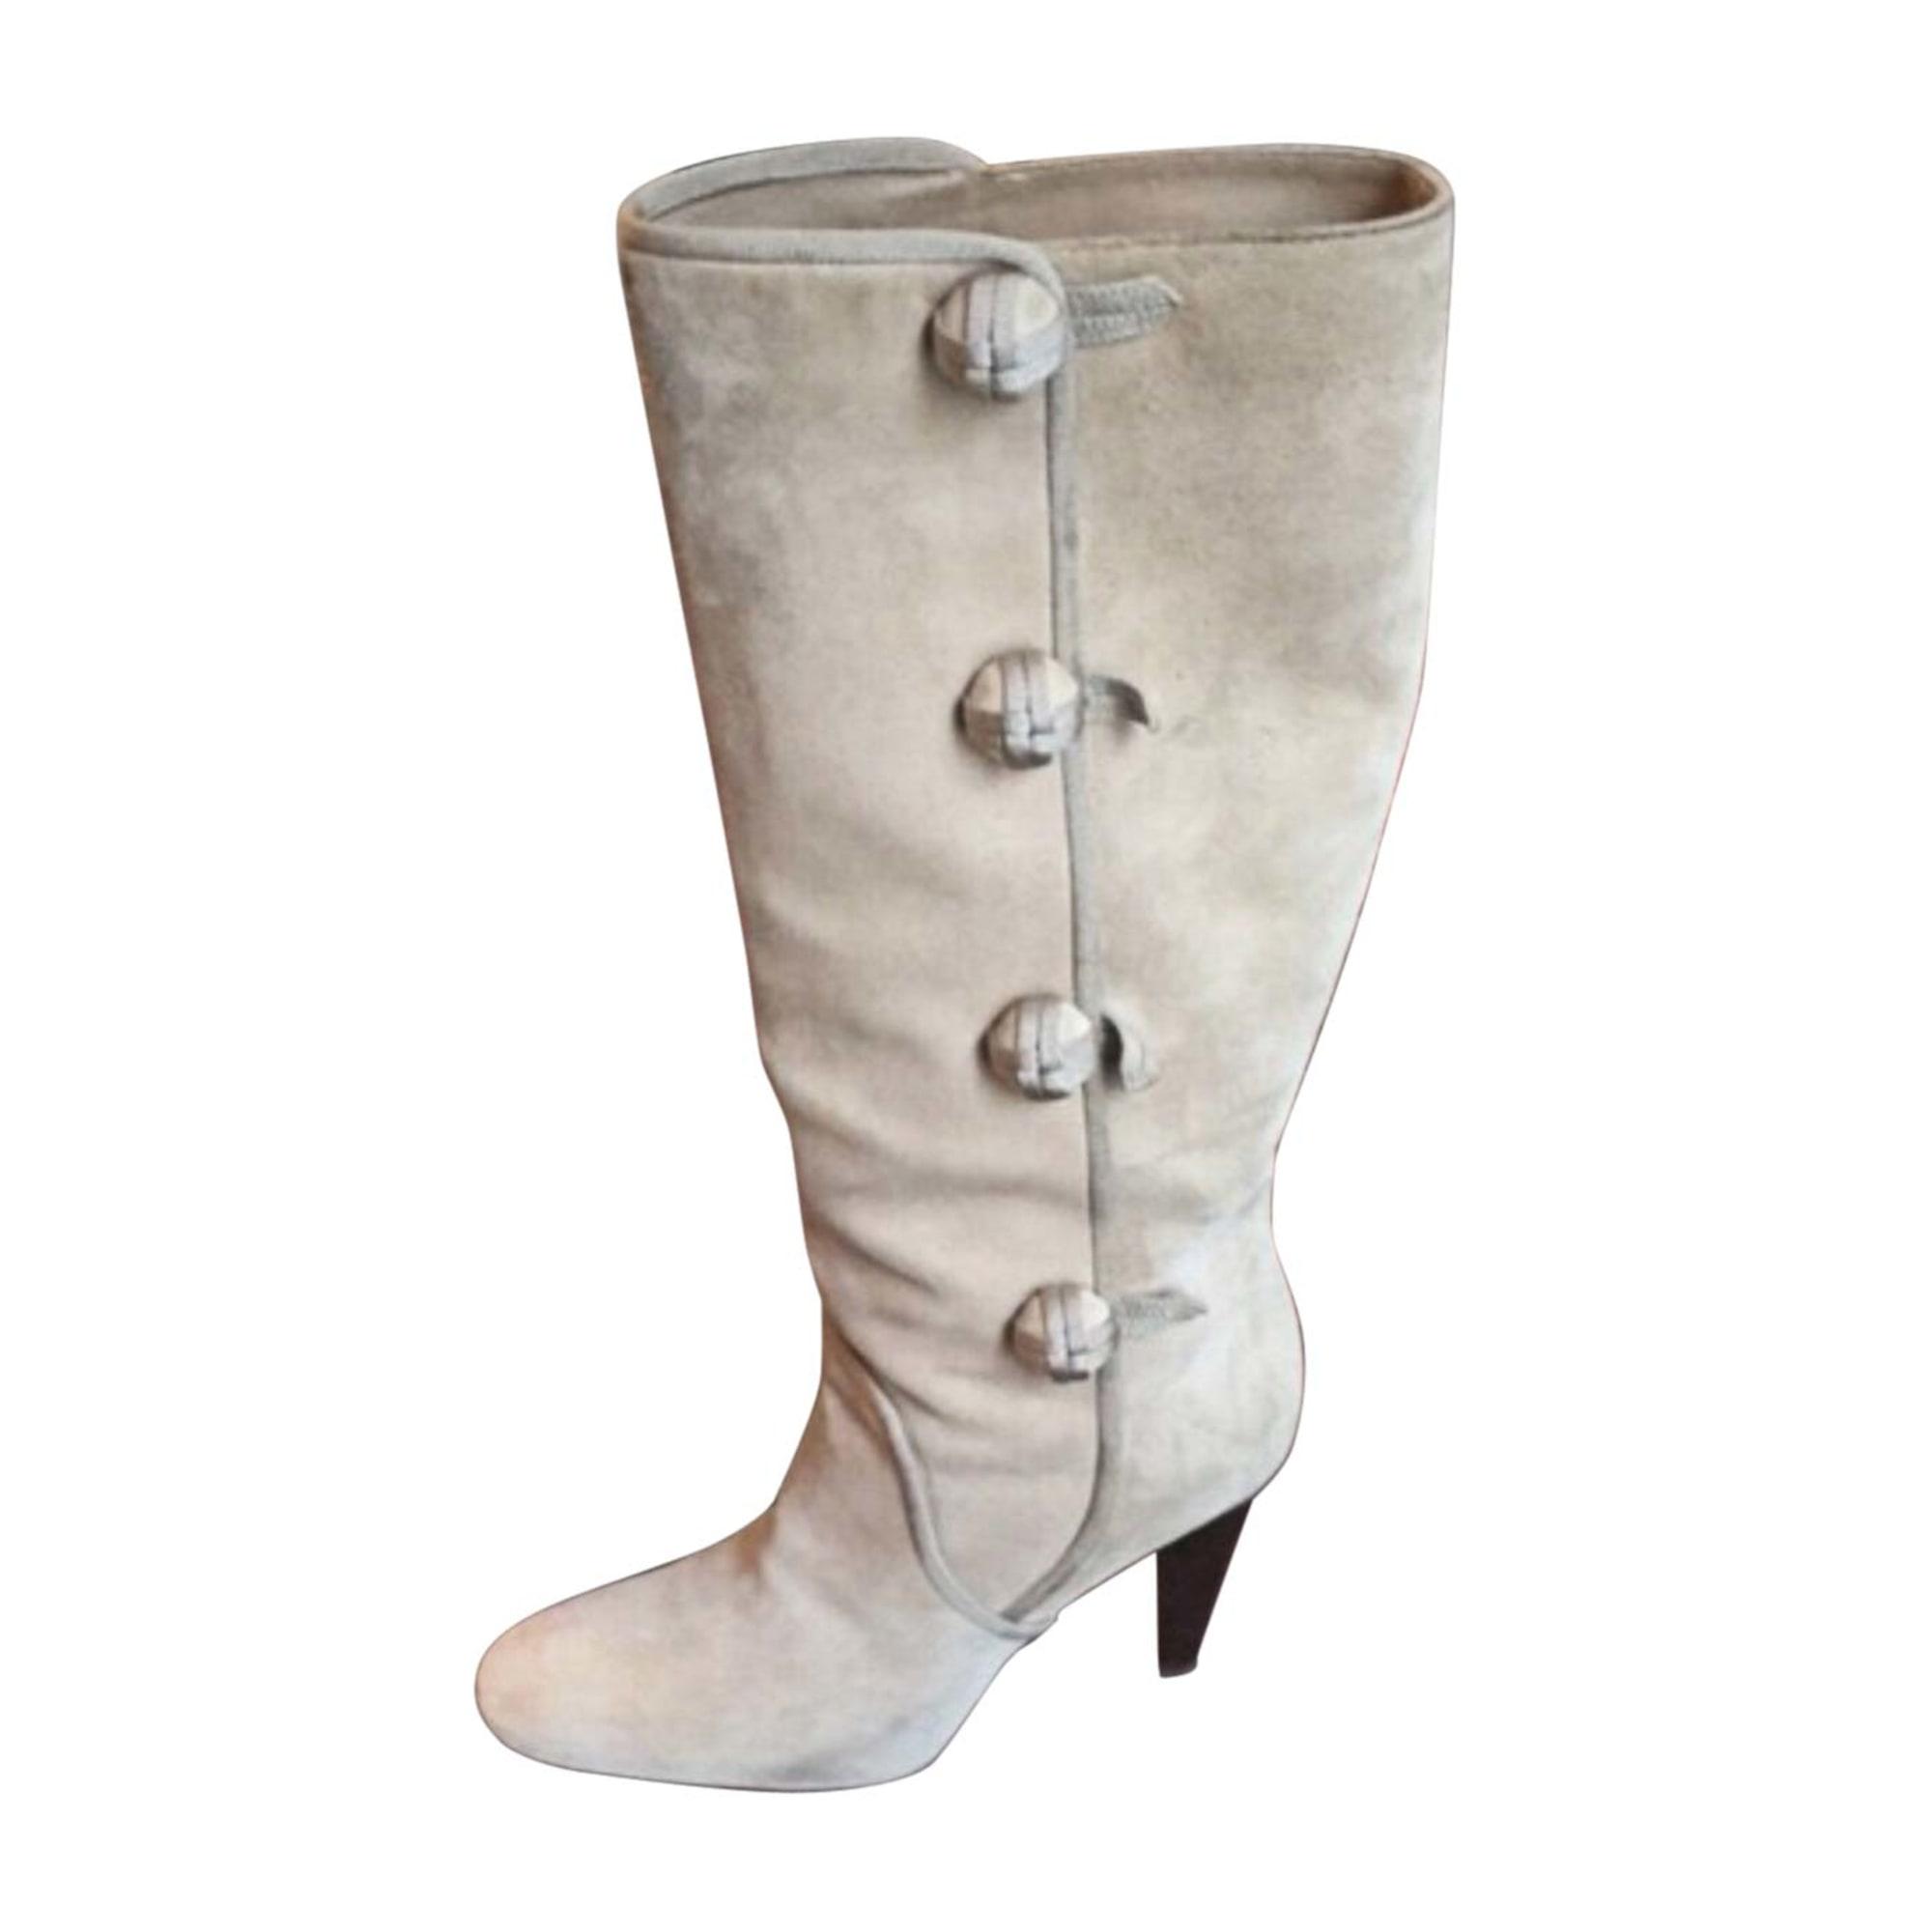 Stivali con tacchi CÉLINE Bianco, bianco sporco, ecru